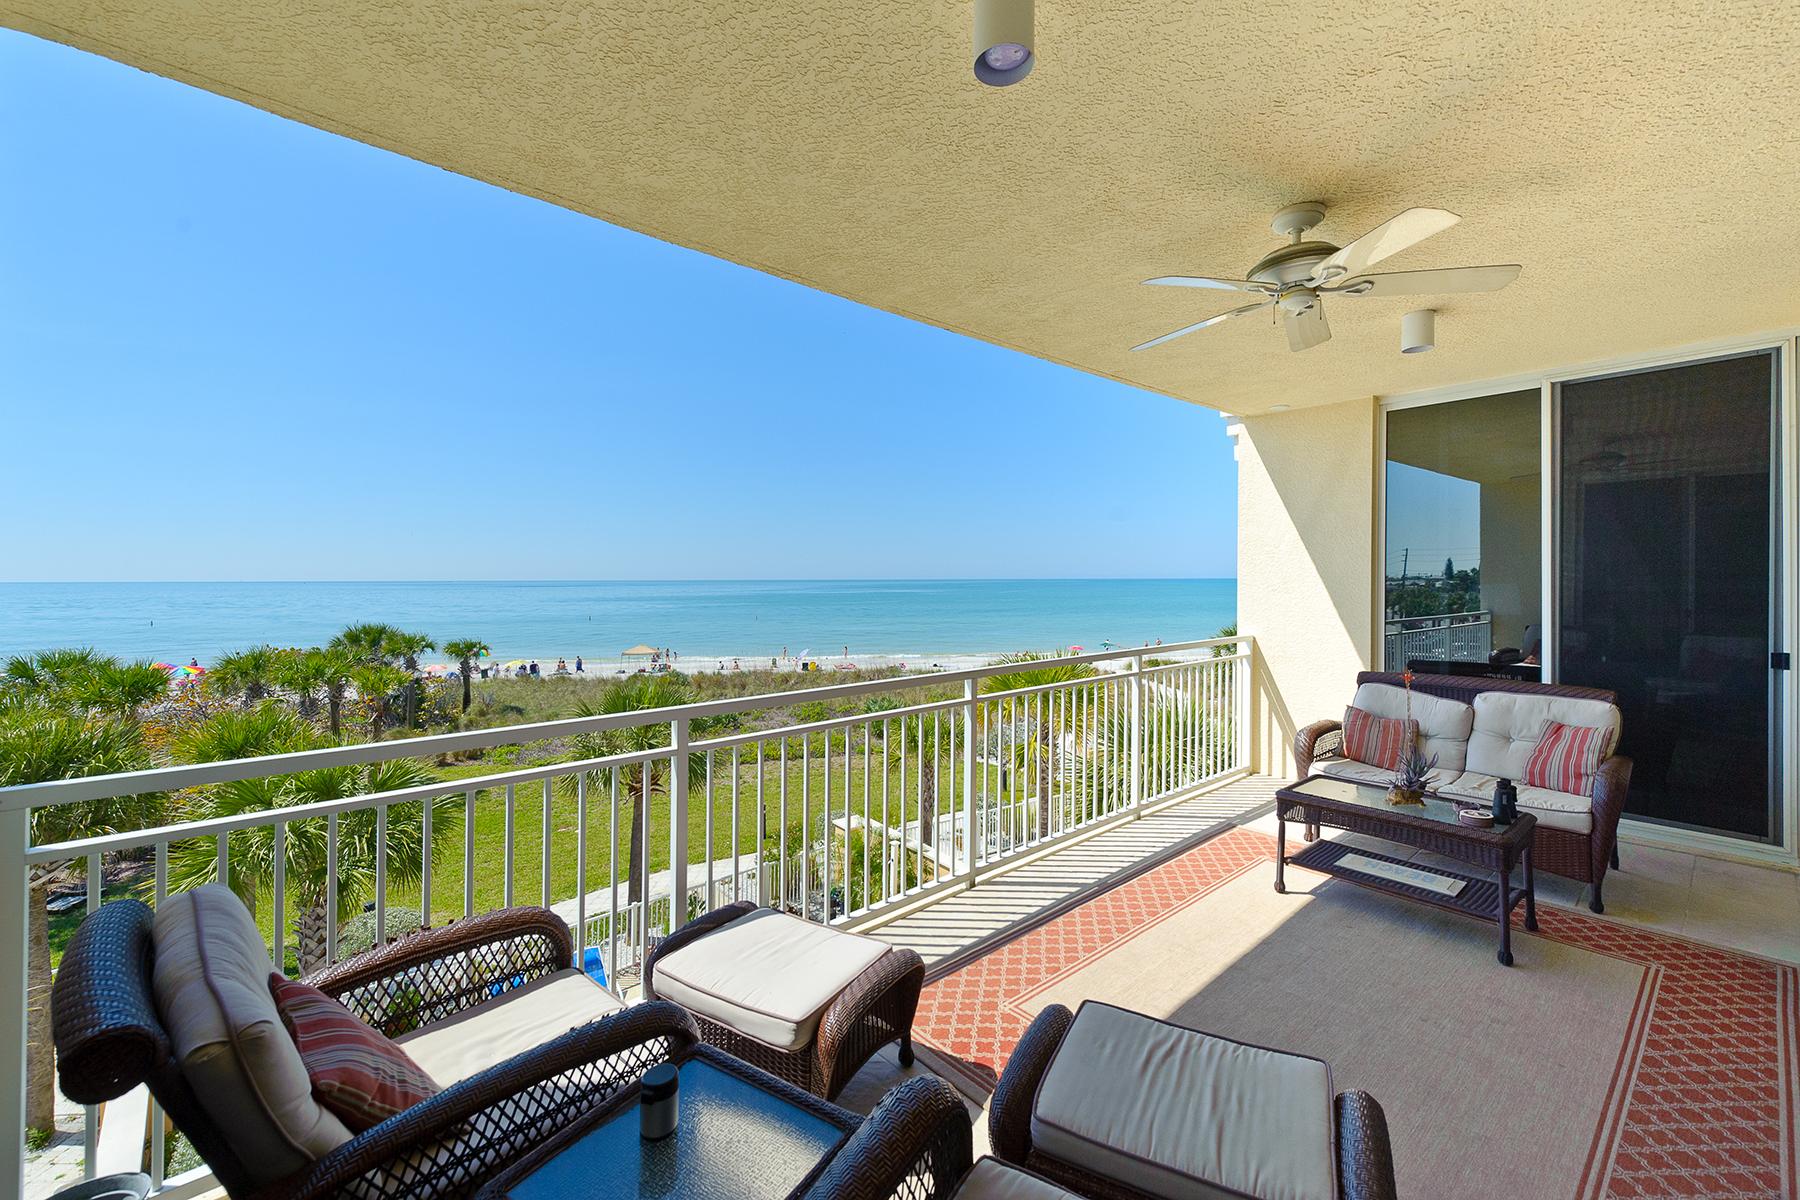 sales property at 15208 Gulf Blvd , 302, Madeira Beach, FL 33708